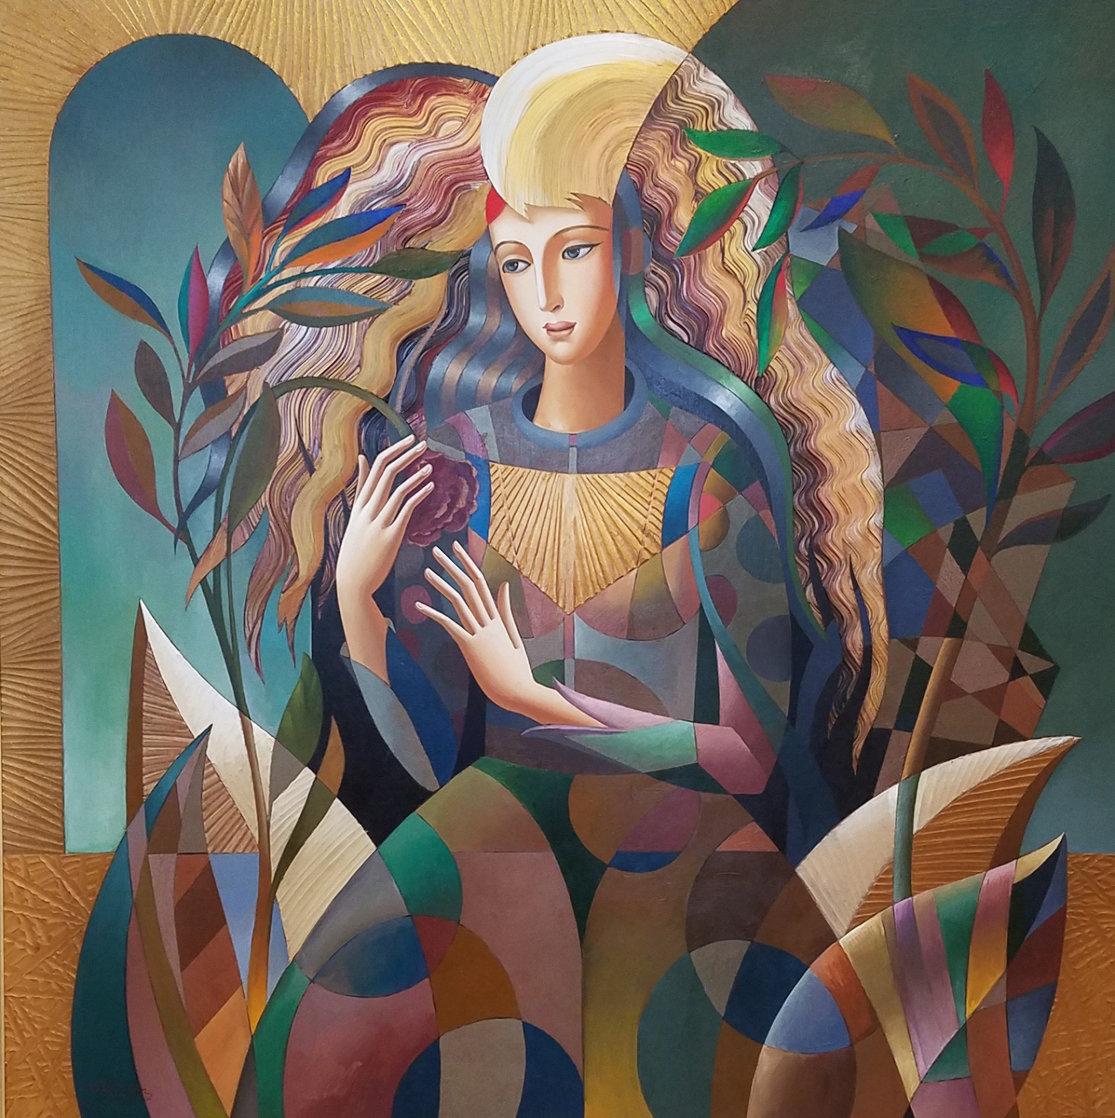 Delicate Flower 52x52 Super Huge Original Painting by Oleg Zhivetin